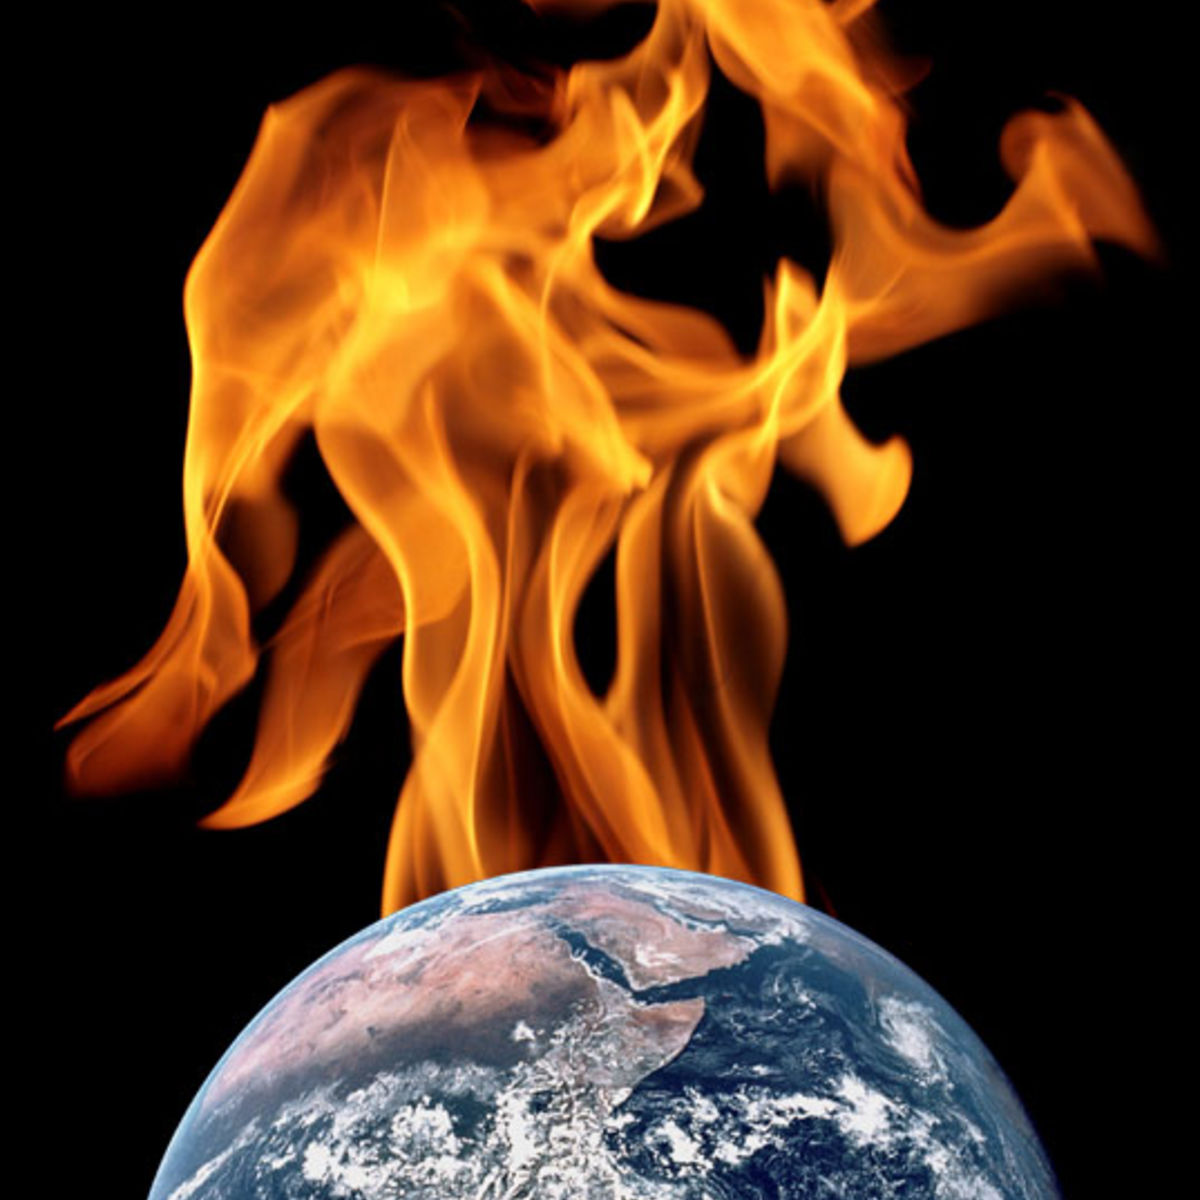 earthonfire_16.jpg